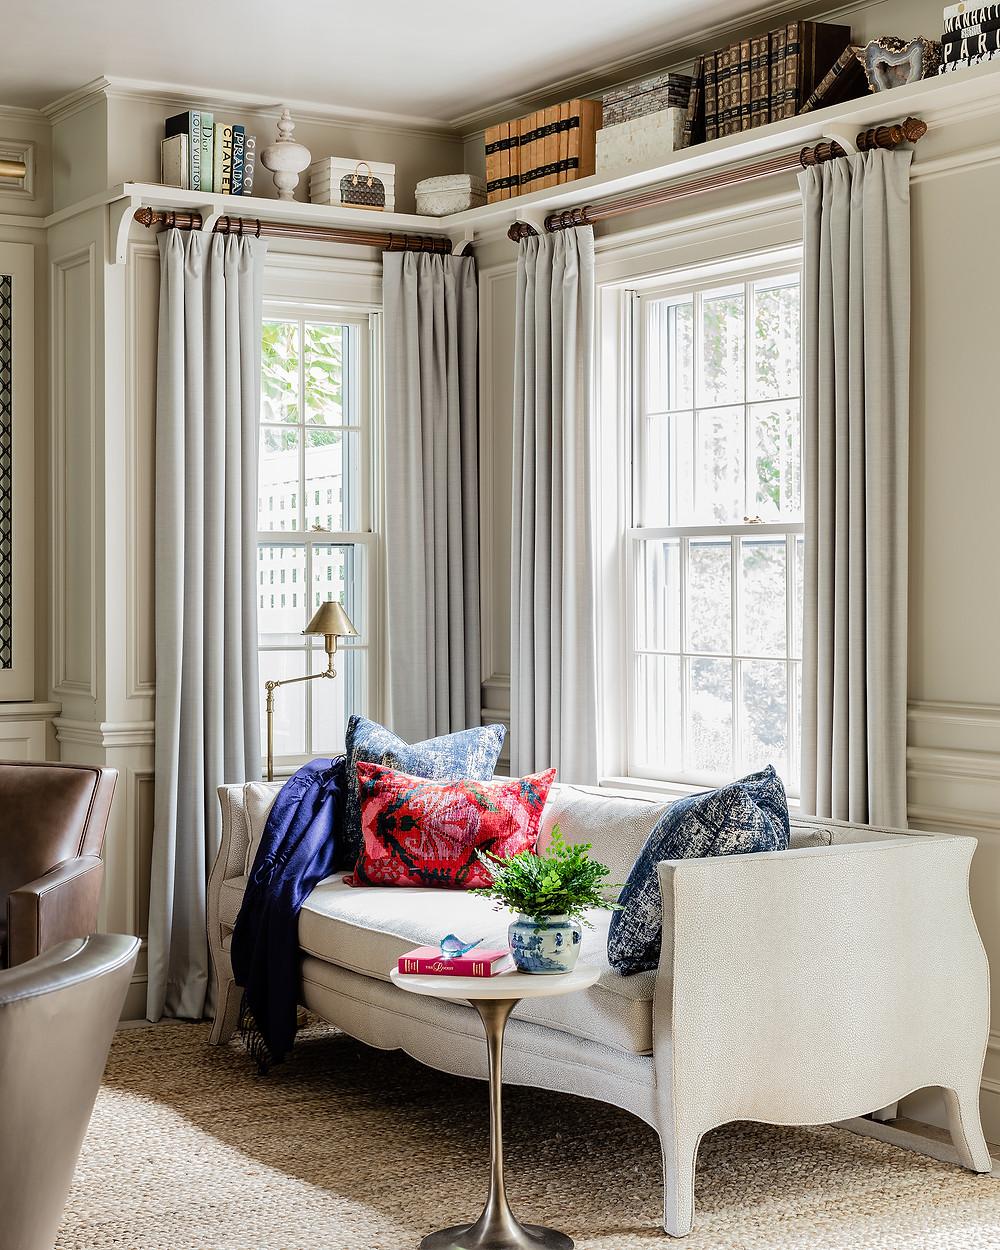 library, chandelier, classy, elegant, chic, design, interior design, robin gannon interiors